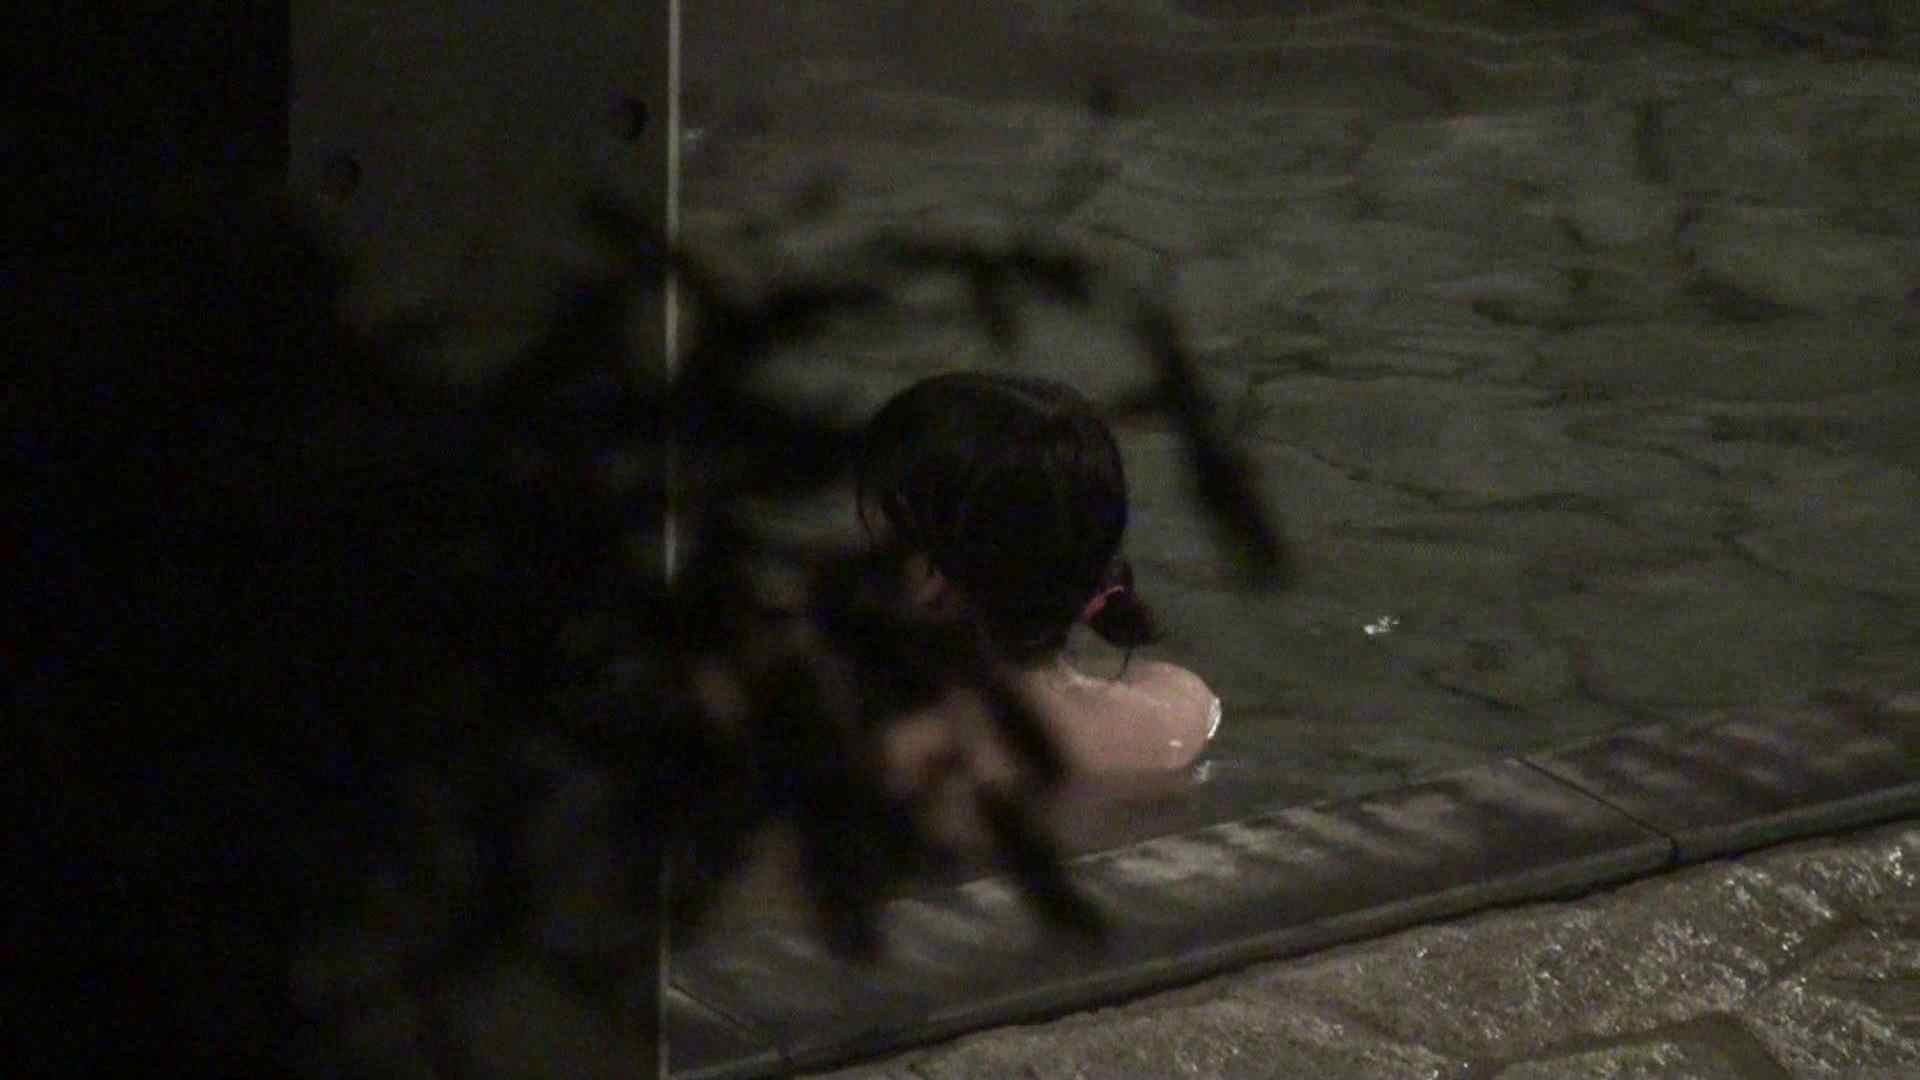 Aquaな露天風呂Vol.343 女体盗撮 盗撮ヌード画像 91連発 80